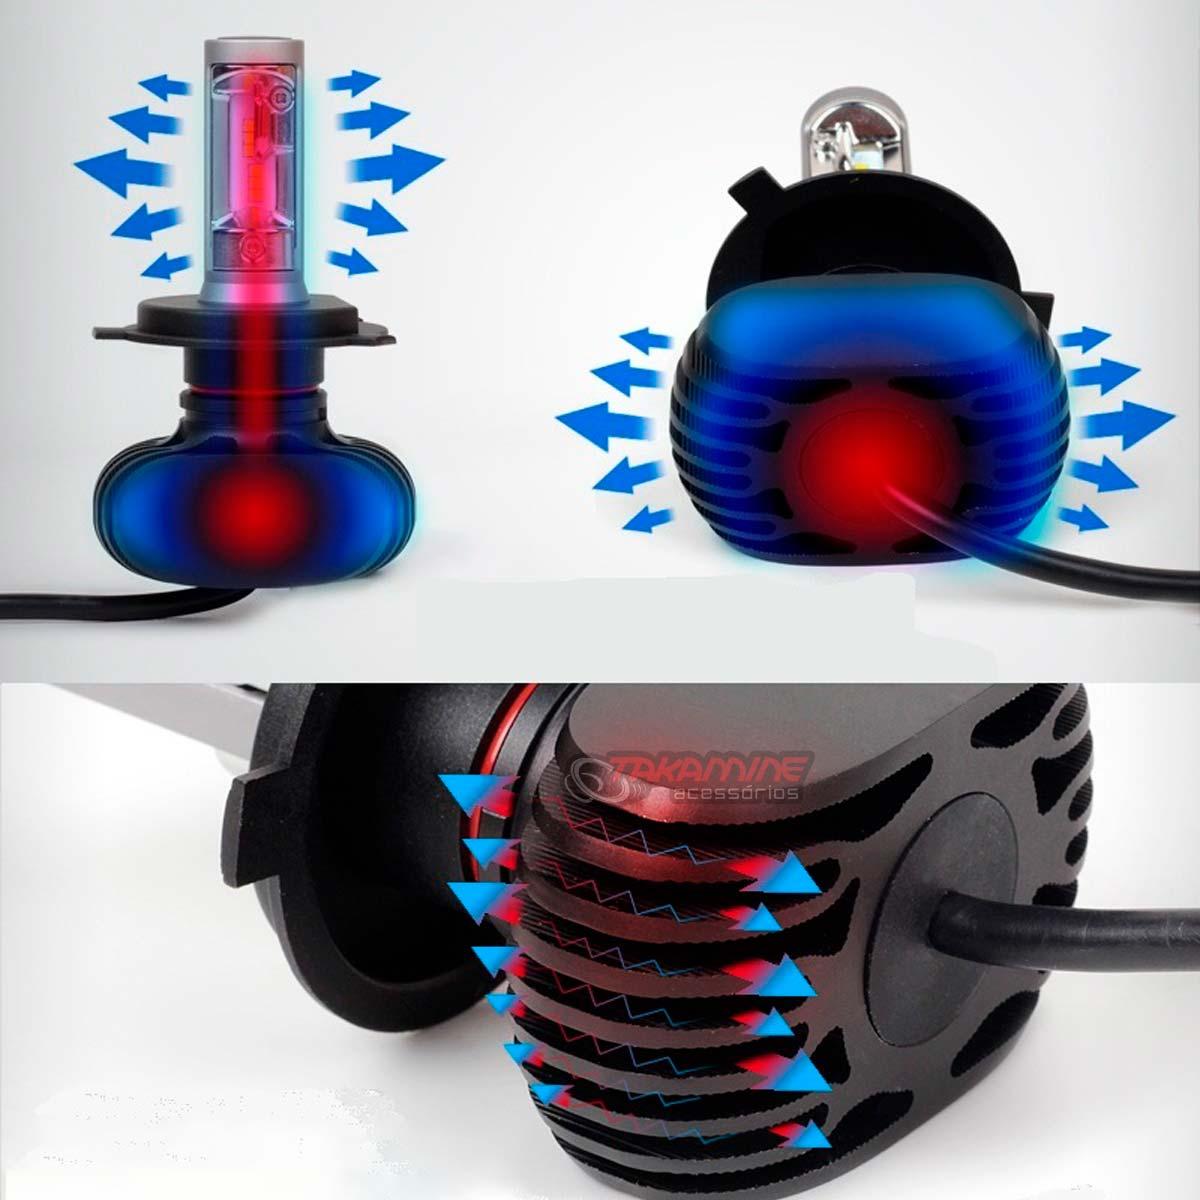 Kit Ultra LED Fox 2010 até 2020 tipo xenon farol baixo H7 50W